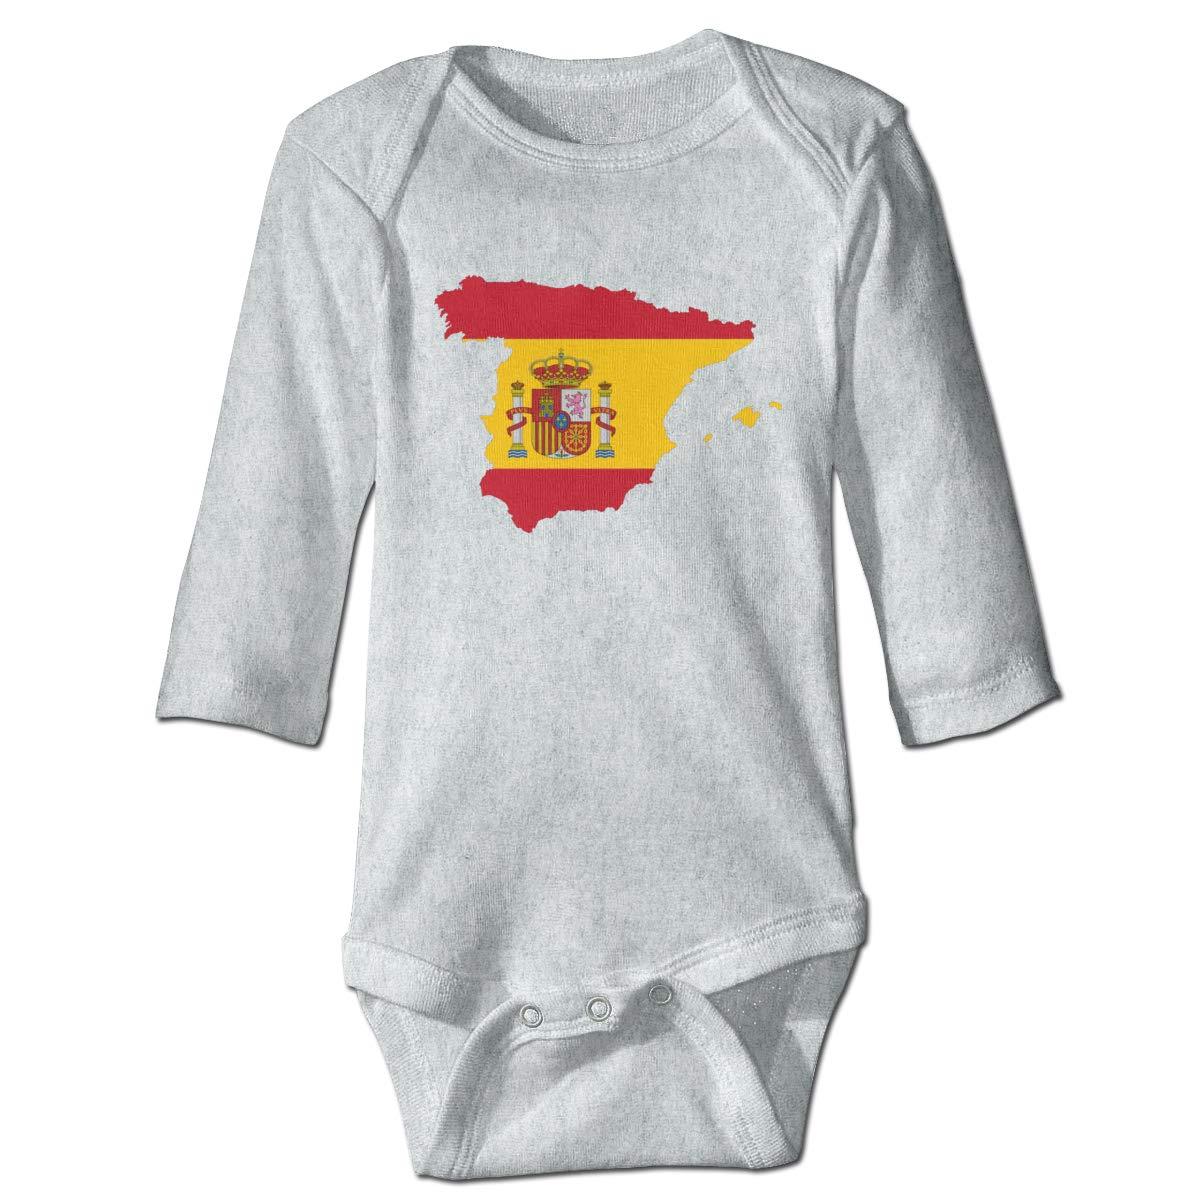 Amazon.com: NUANYANG - Traje de bebé de manga larga con ...